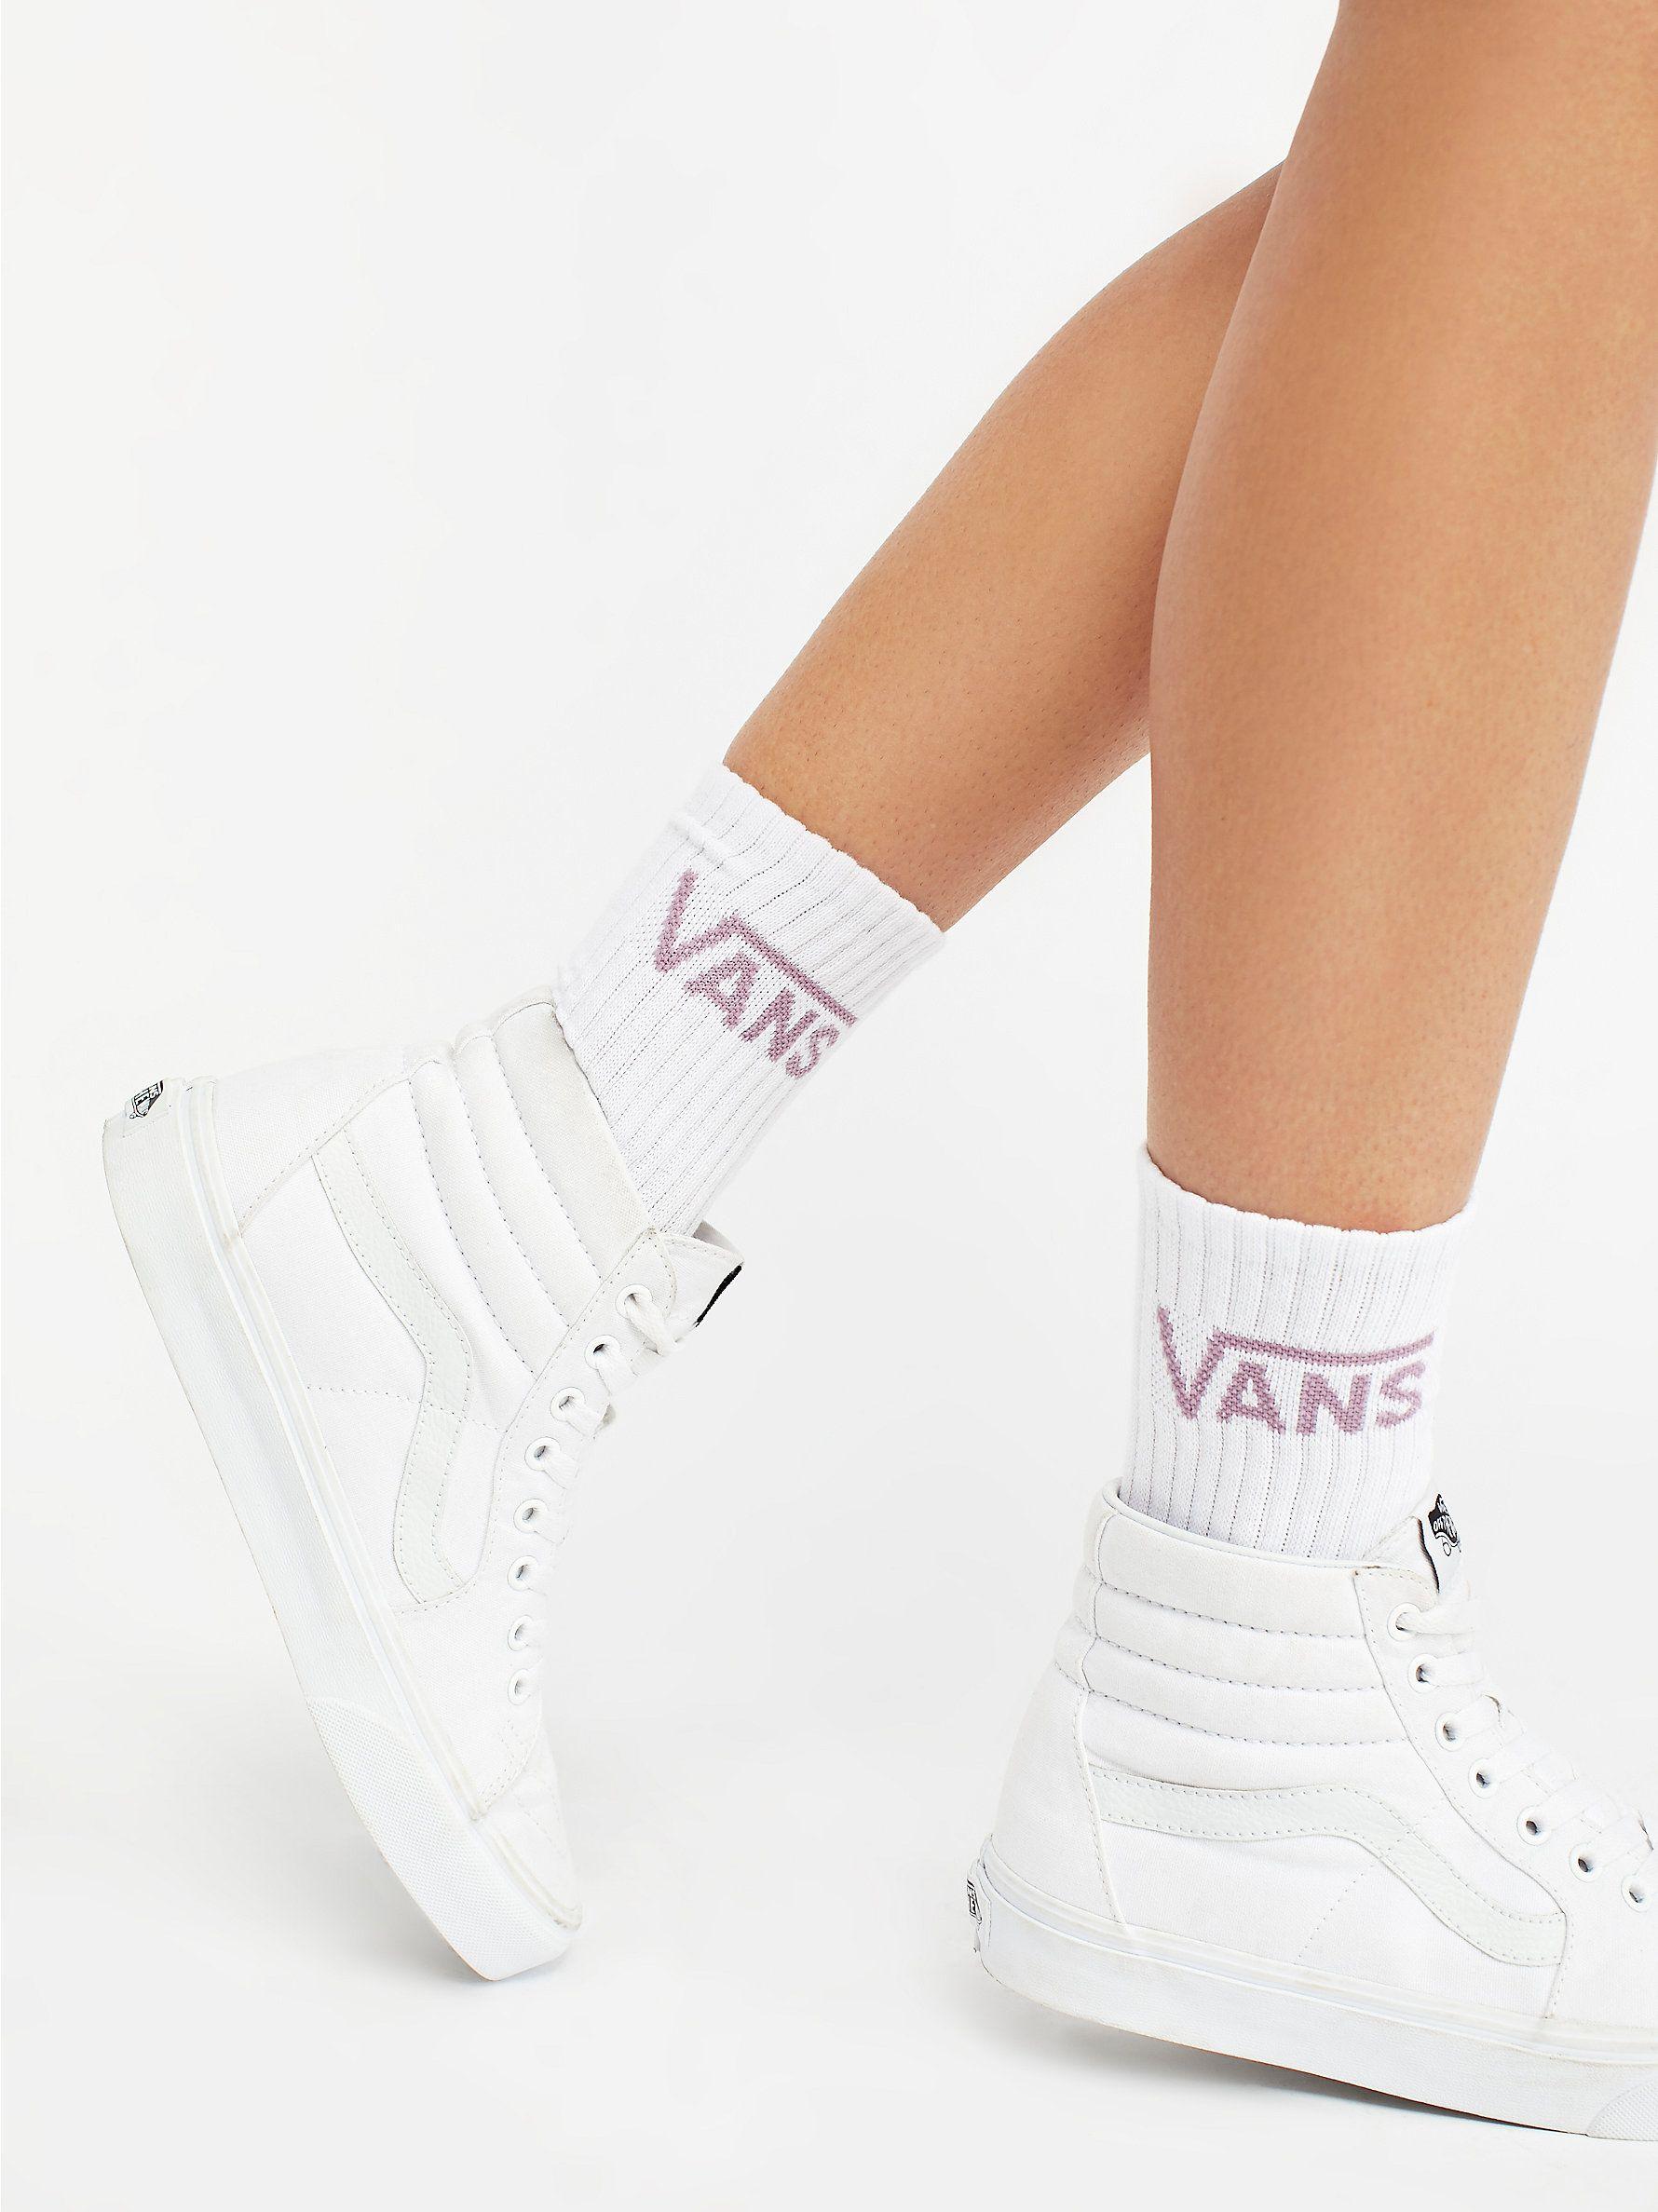 Old School Crew Socks 3 Pack Fit Womens Shoe Sizes 7 10 3